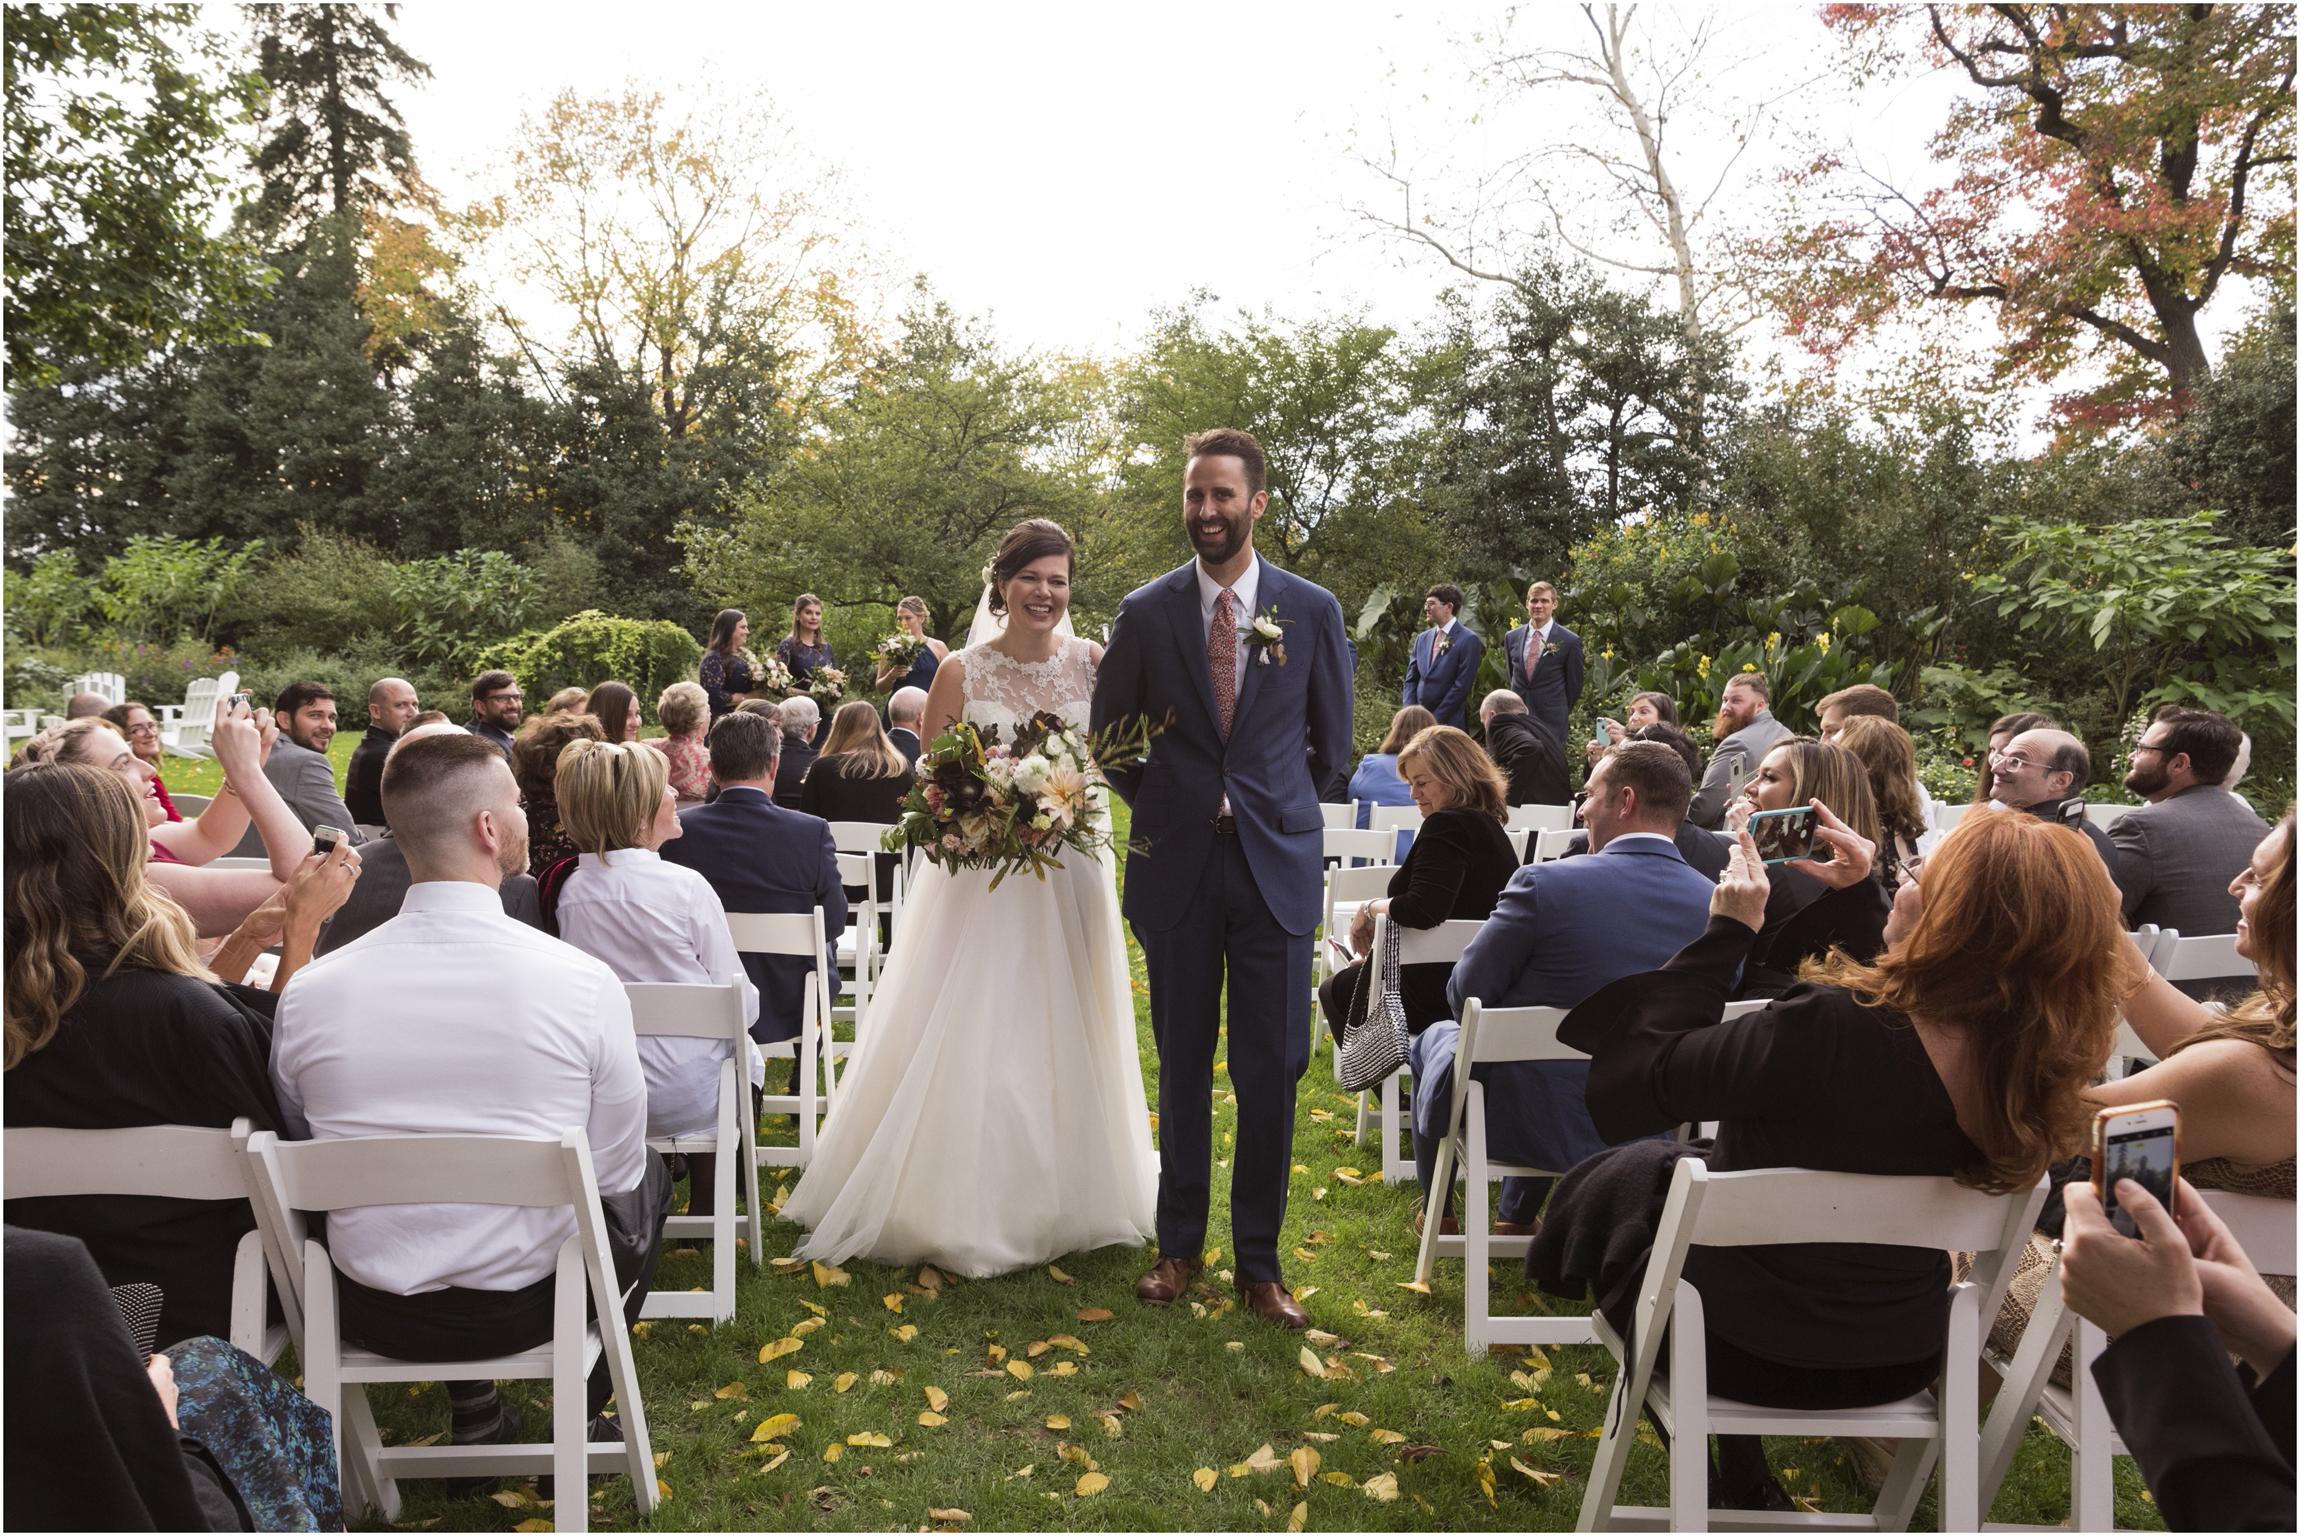 ©FianderFoto_Melissa_Mark_Wedding_Maryland_031.jpg